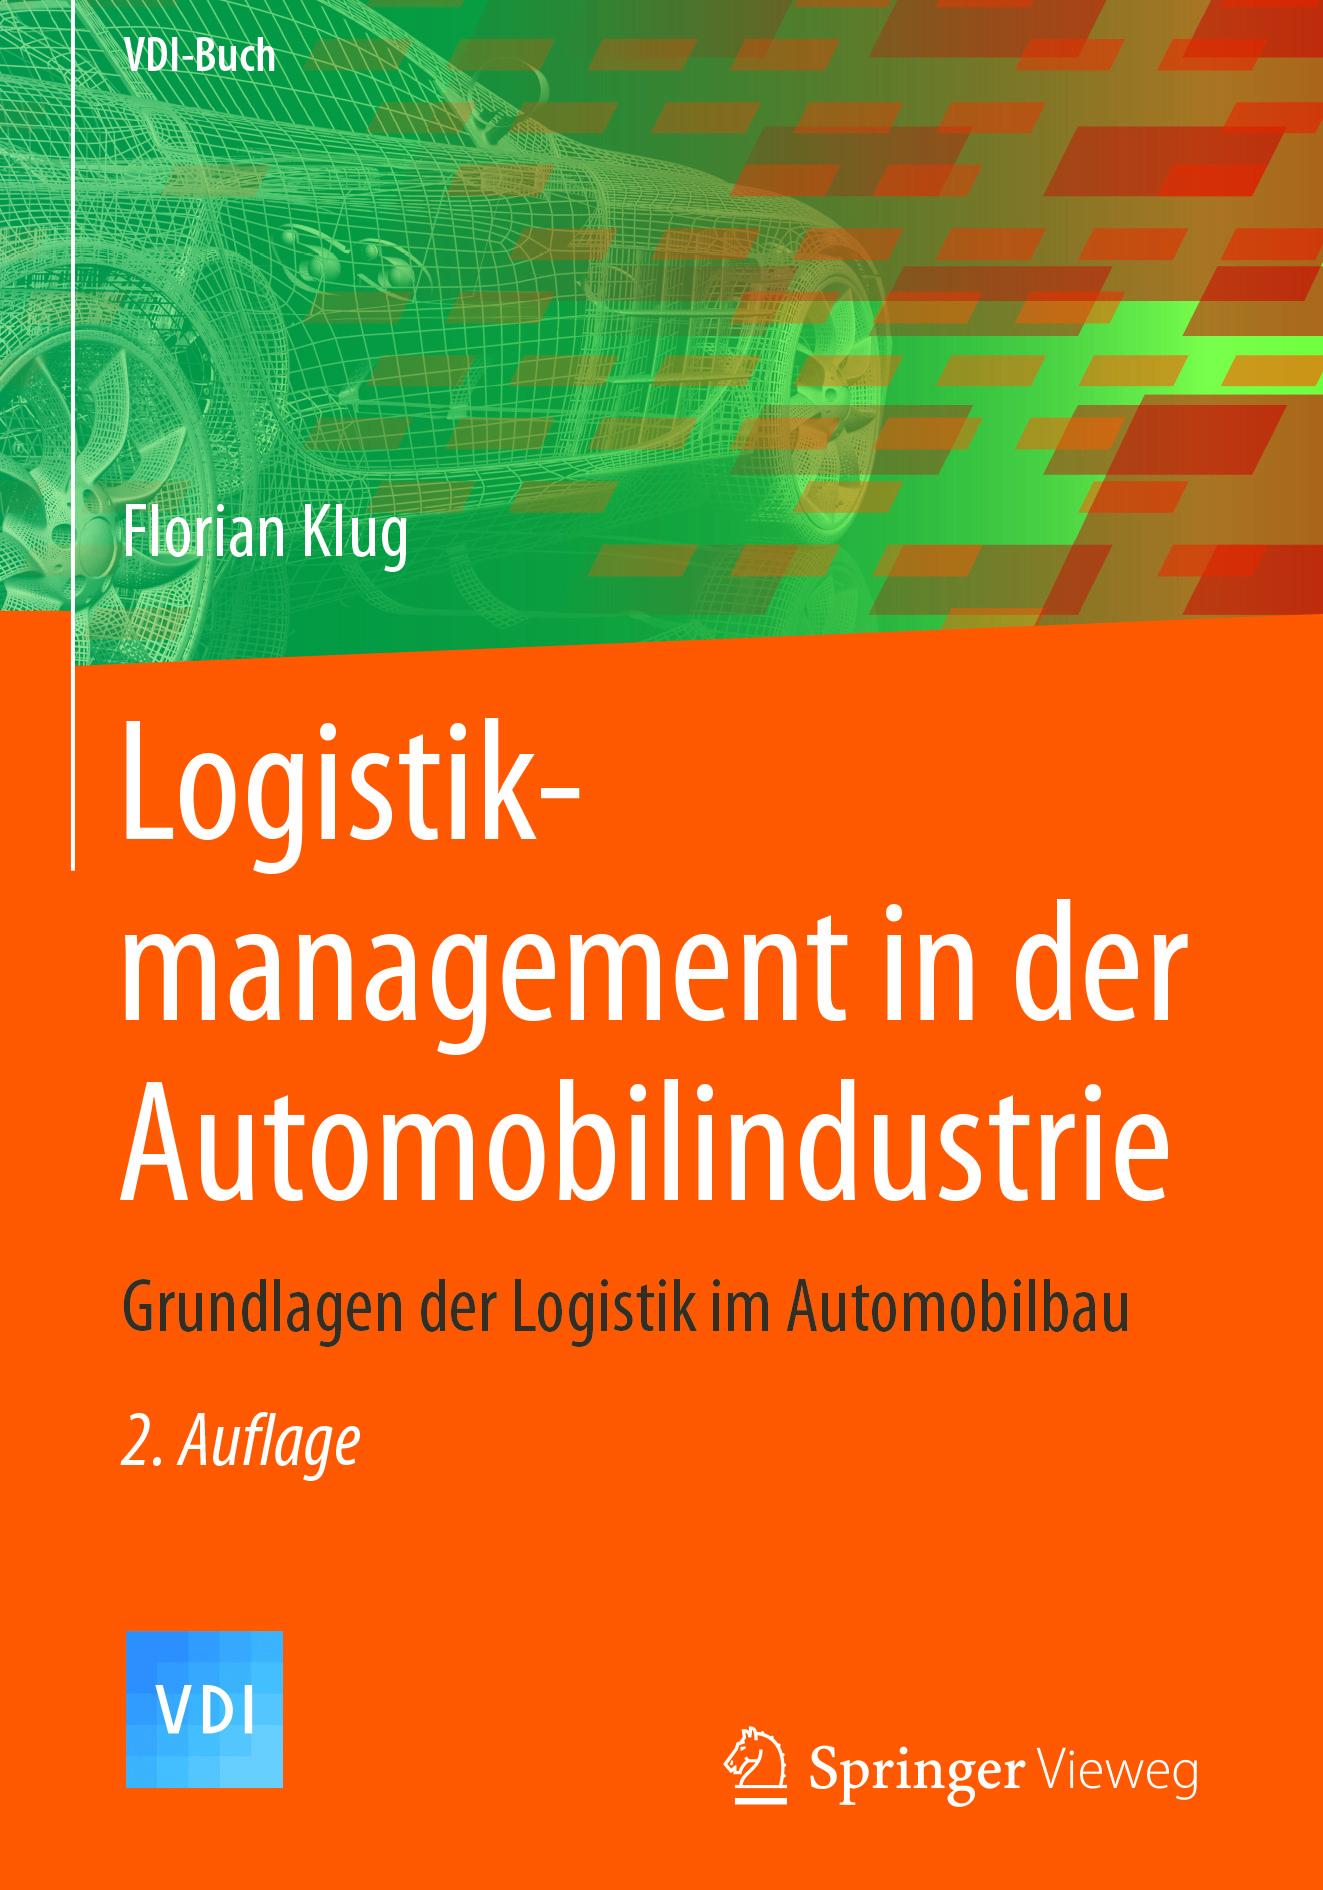 Klug, Florian - Logistikmanagement in der Automobilindustrie, ebook